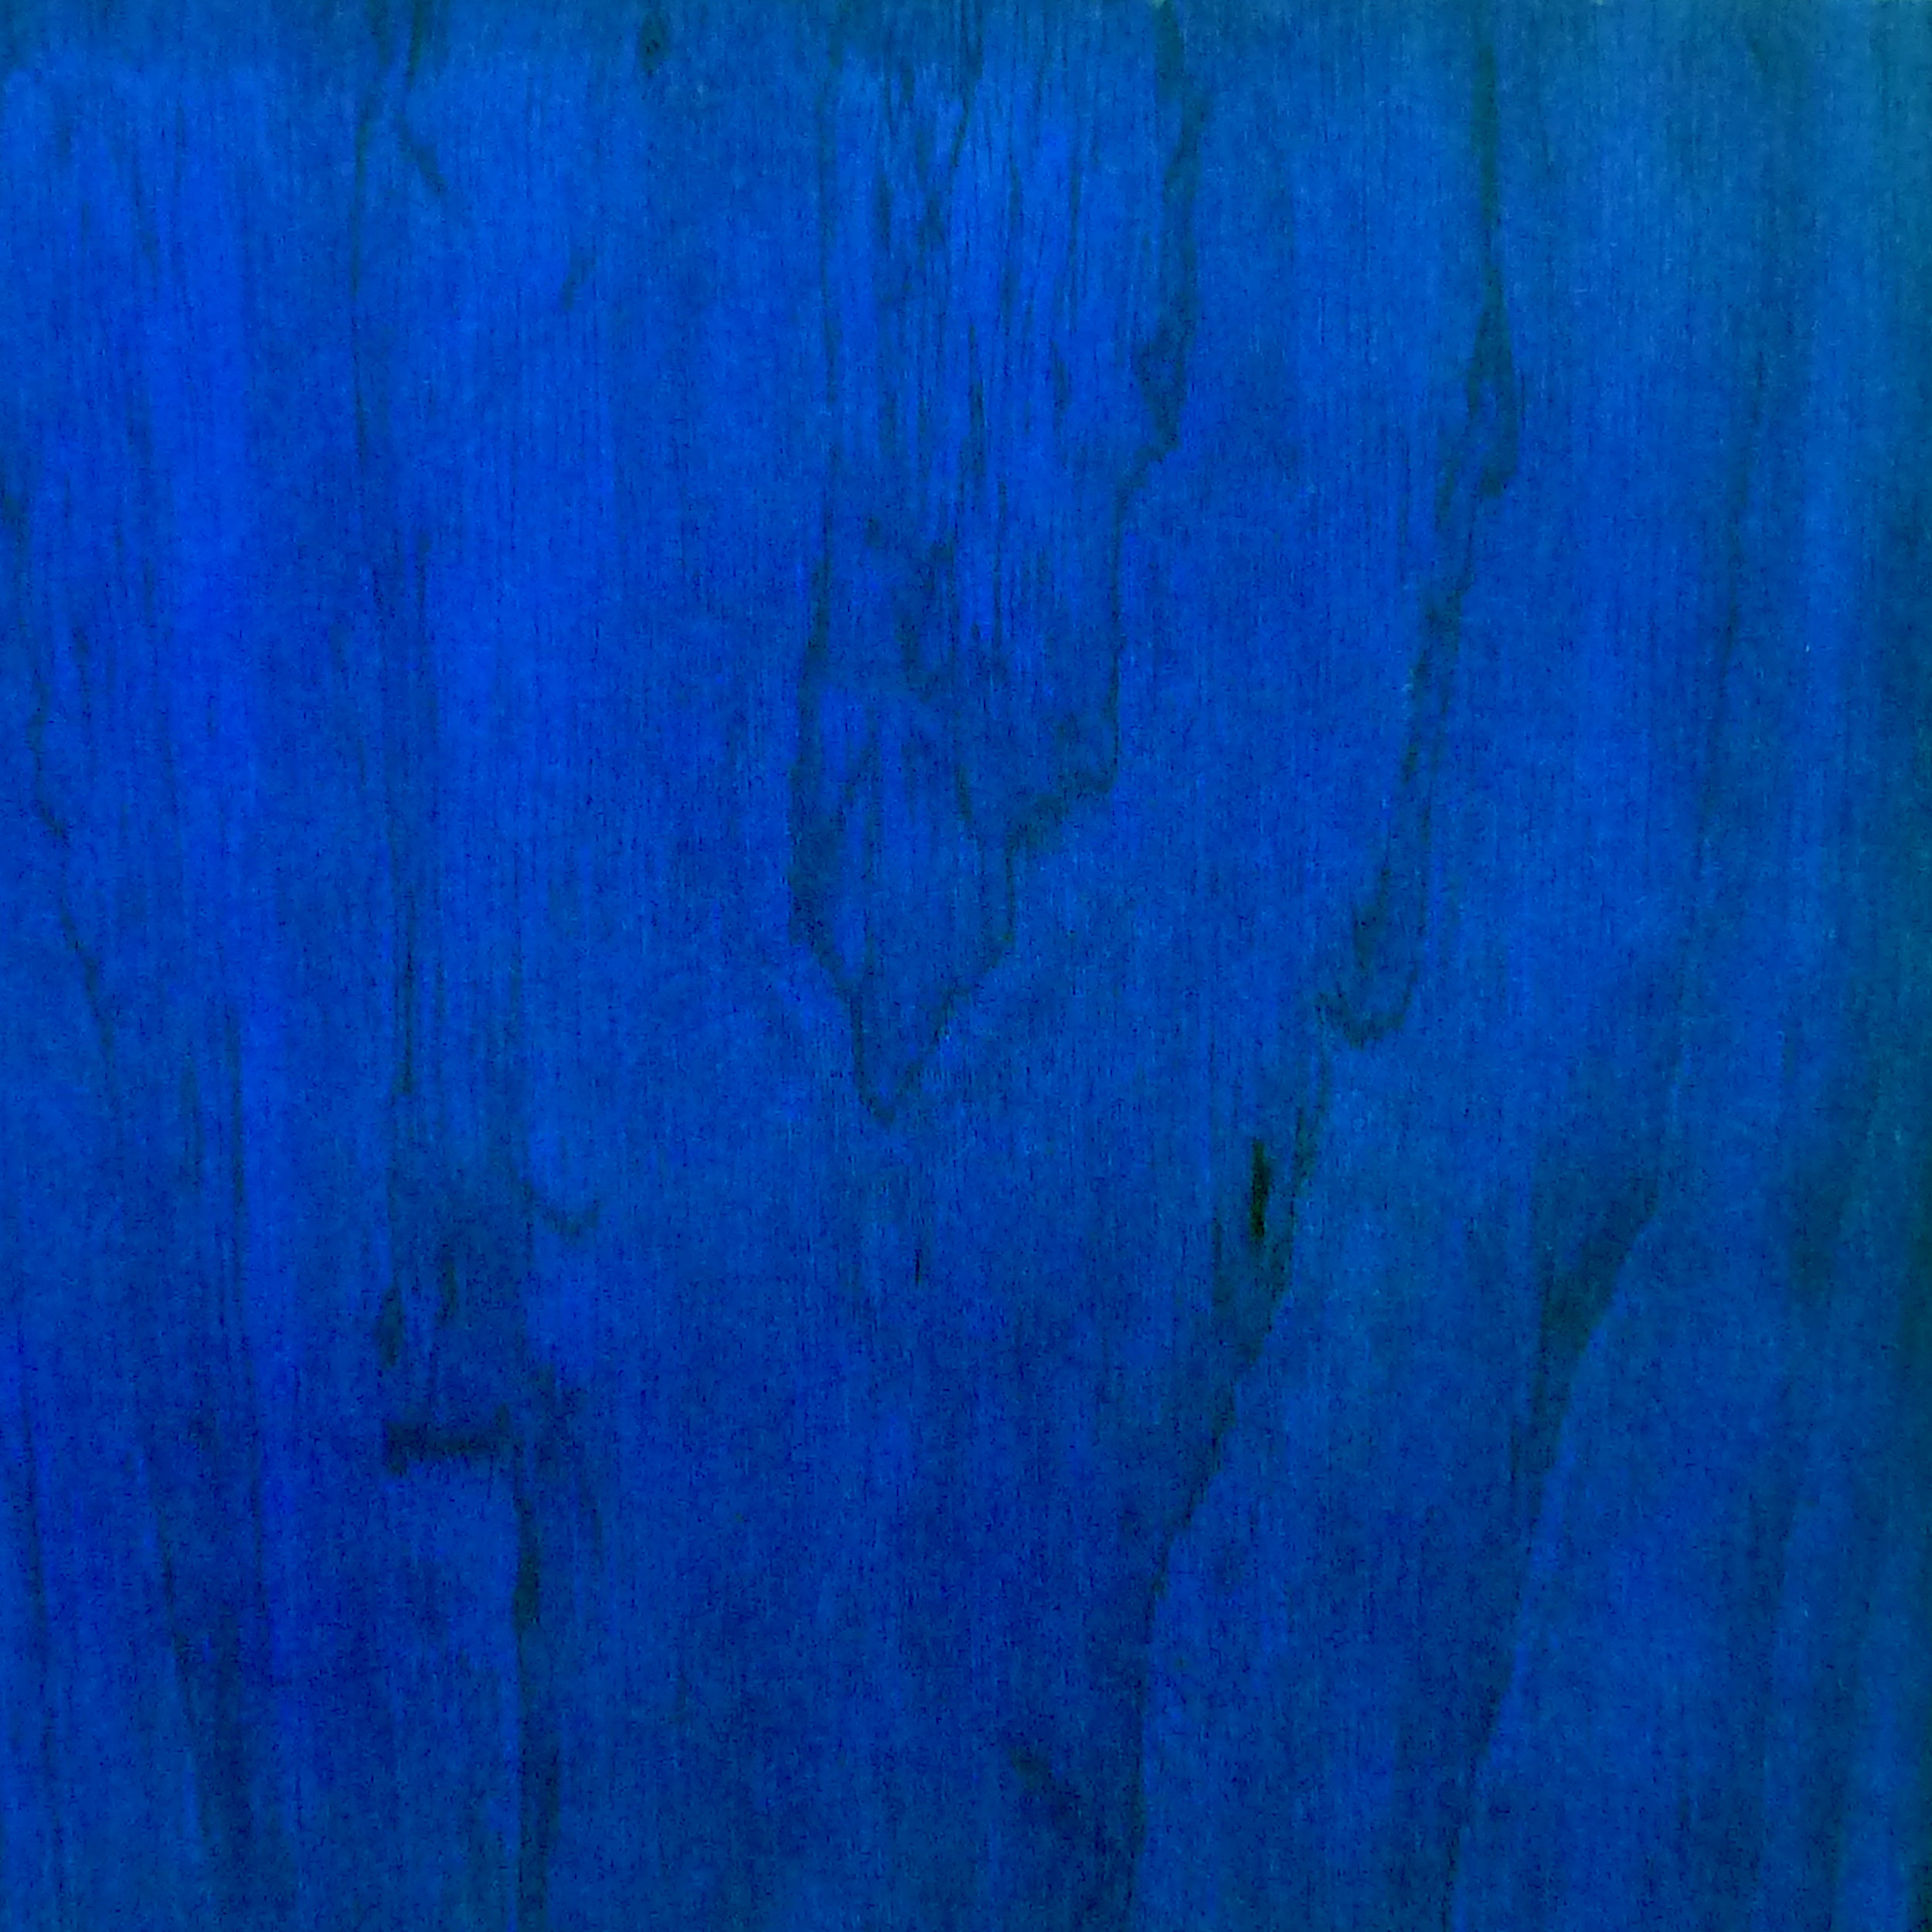 Blue, Light